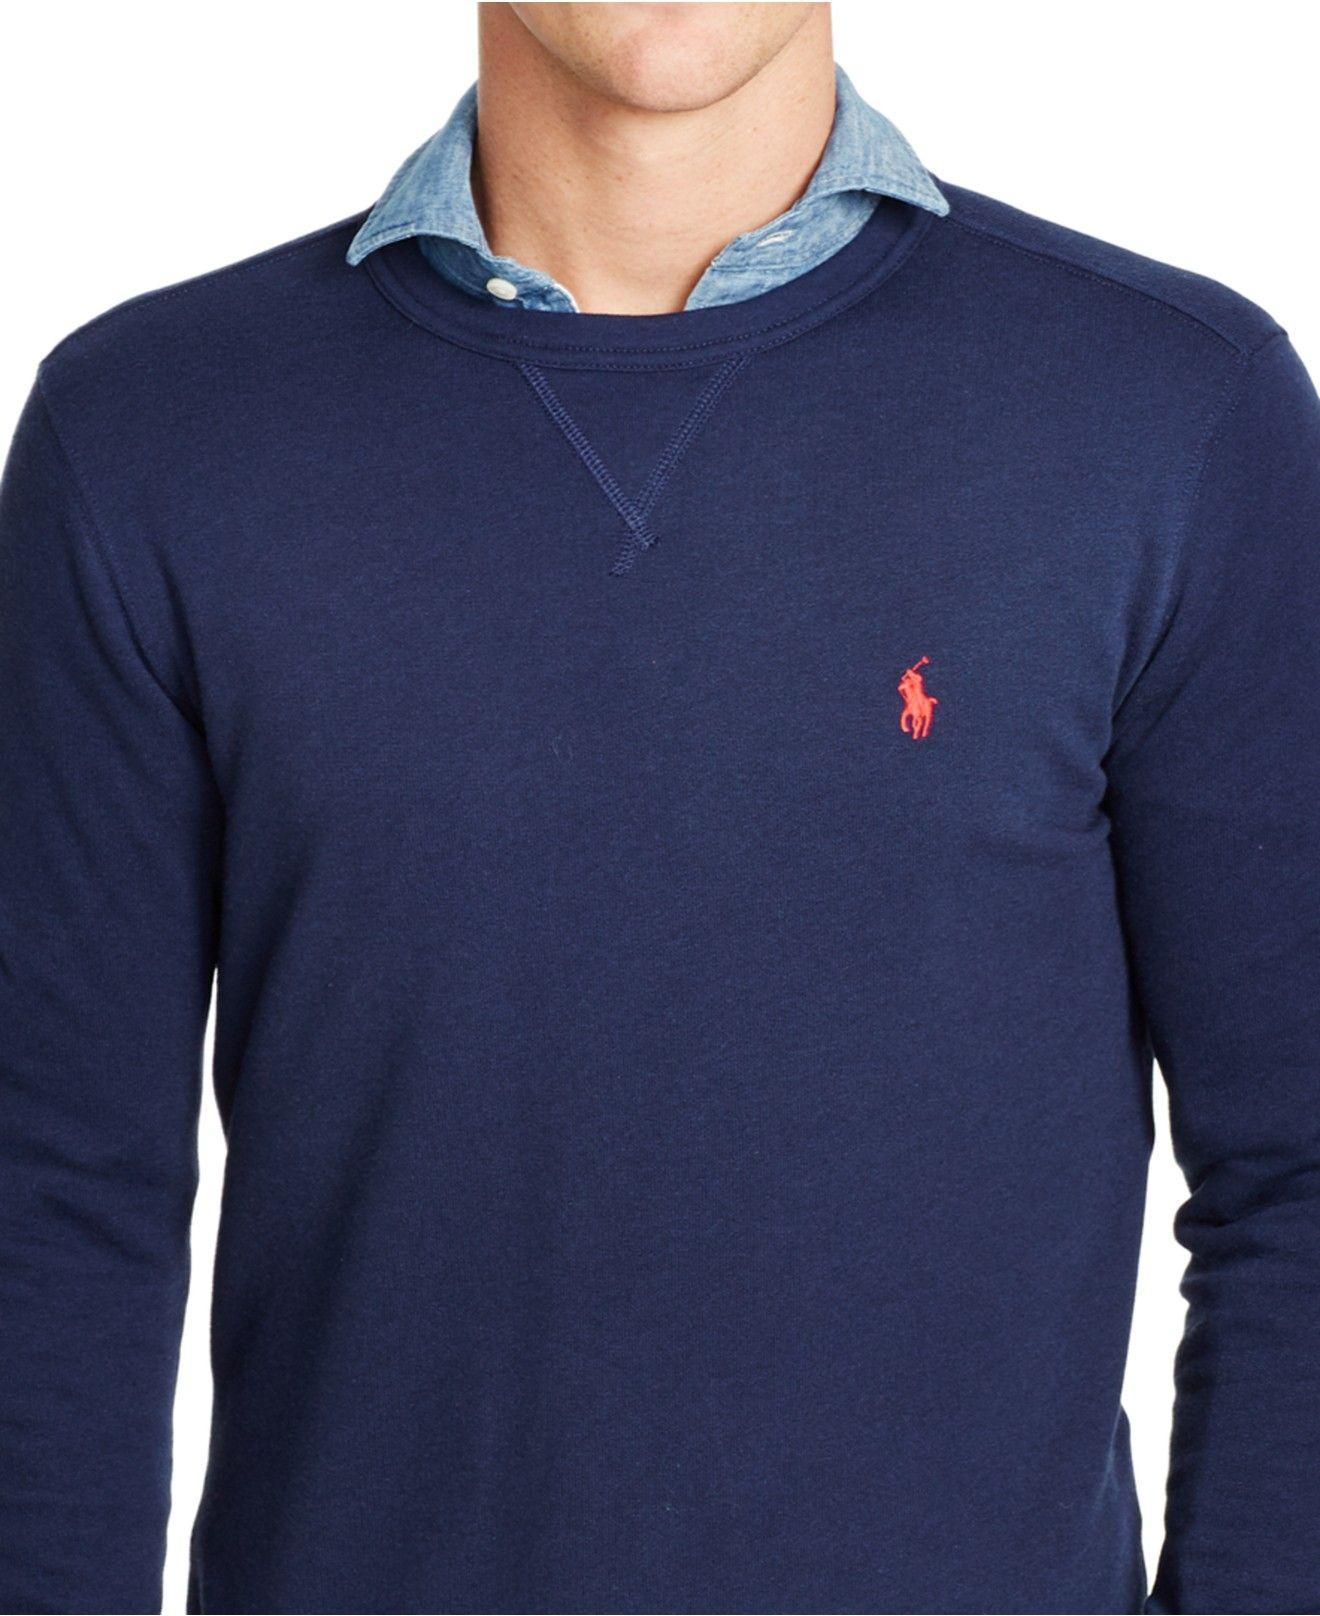 Terry lightweight sweatshirt - Blue Polo Ralph Lauren Clearance Cost 3V0Go2tHb